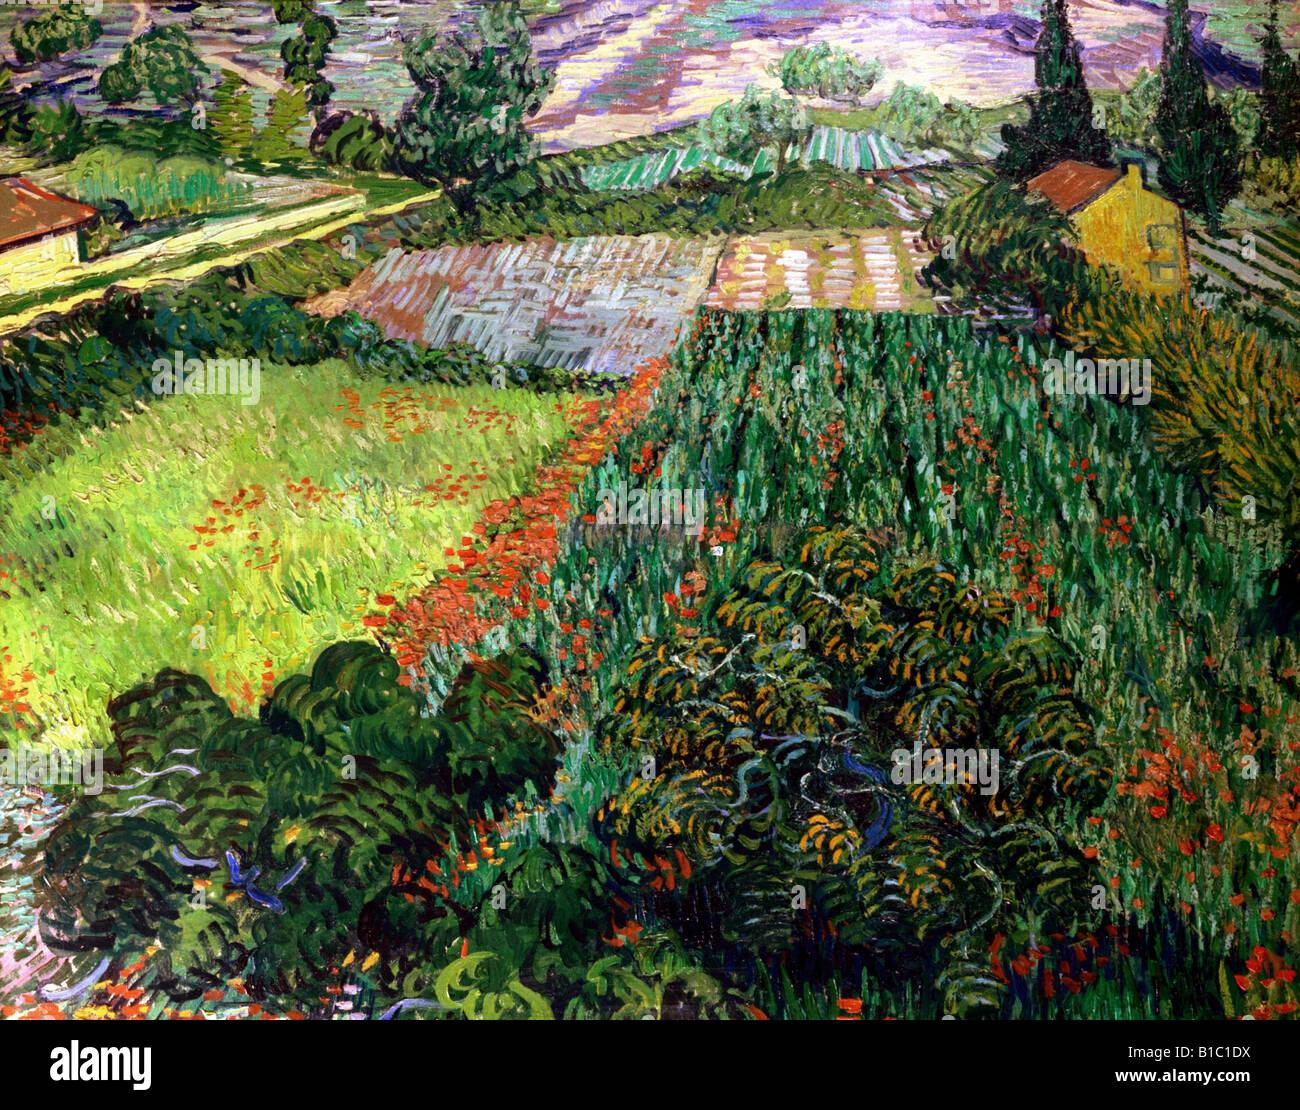 "Bildende Kunst, Gogh, Vincent van, (1853-1890), Malerei, ""Mohnfeld,"", 1889 / 1890, Öl auf Leinwand, Stockbild"